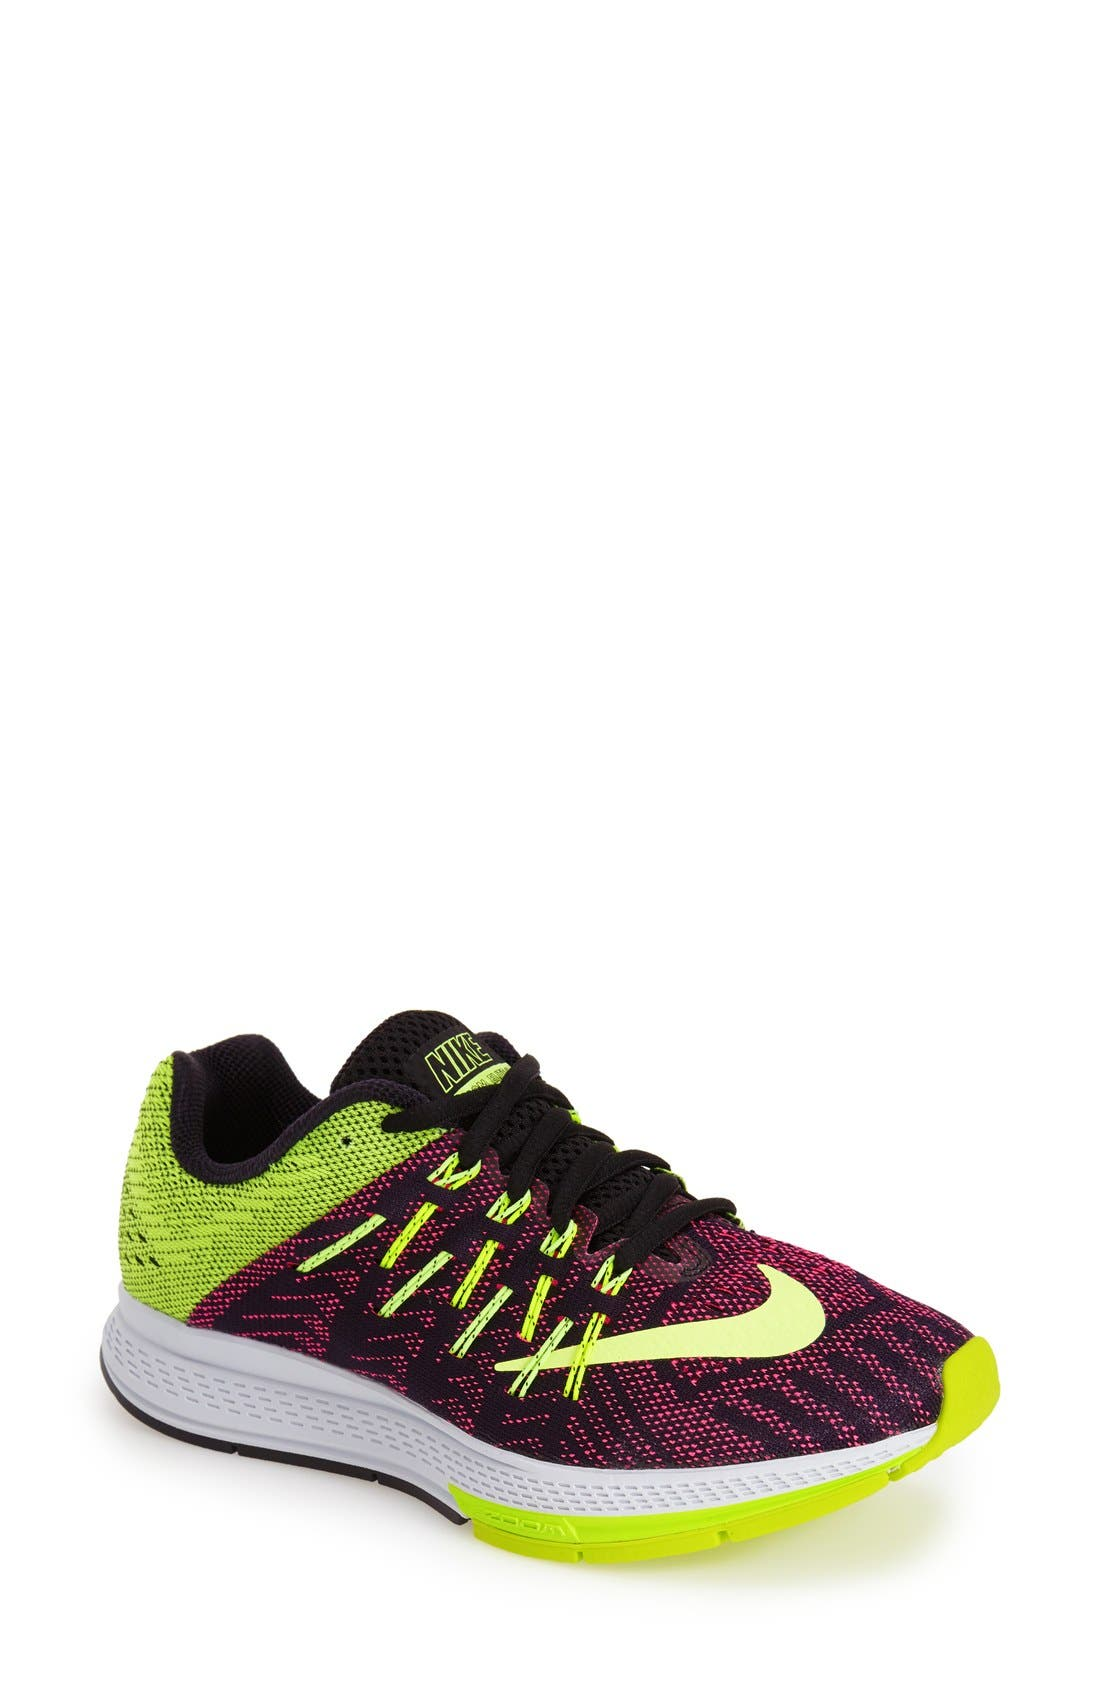 Alternate Image 1 Selected - Nike 'Air Zoom Elite 8' Running Shoe (Women)